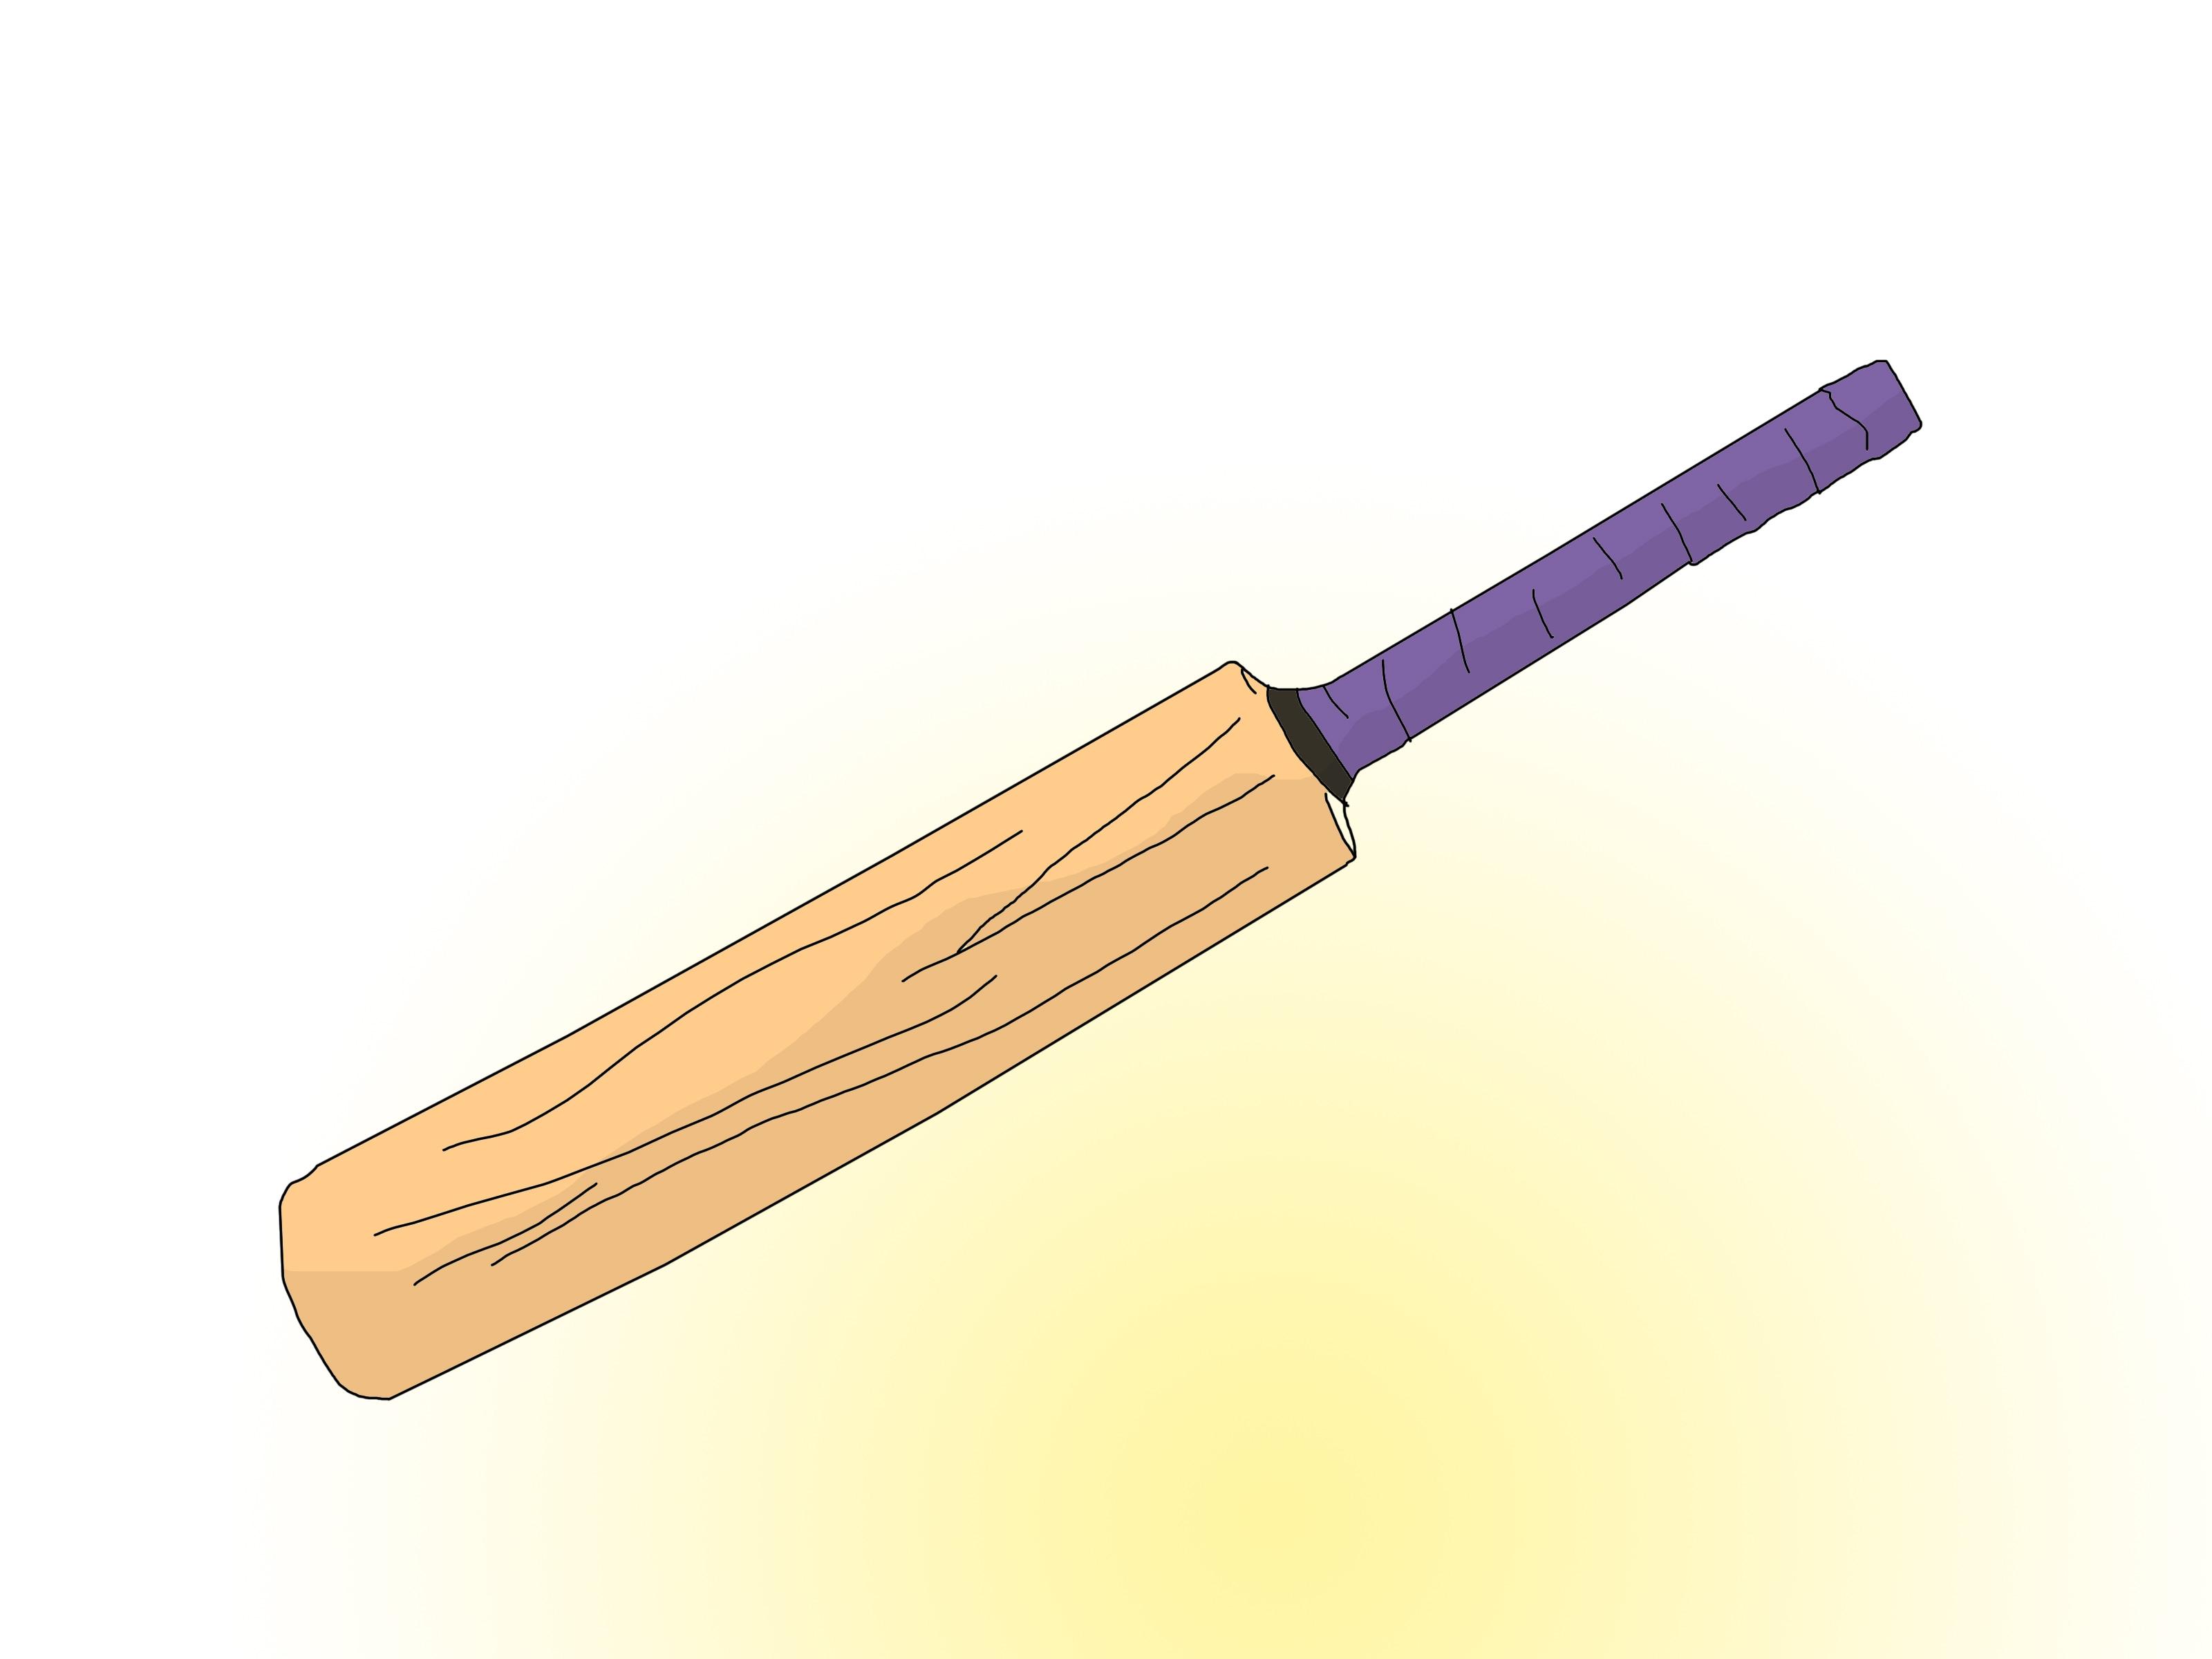 Cricket bat image clipart.